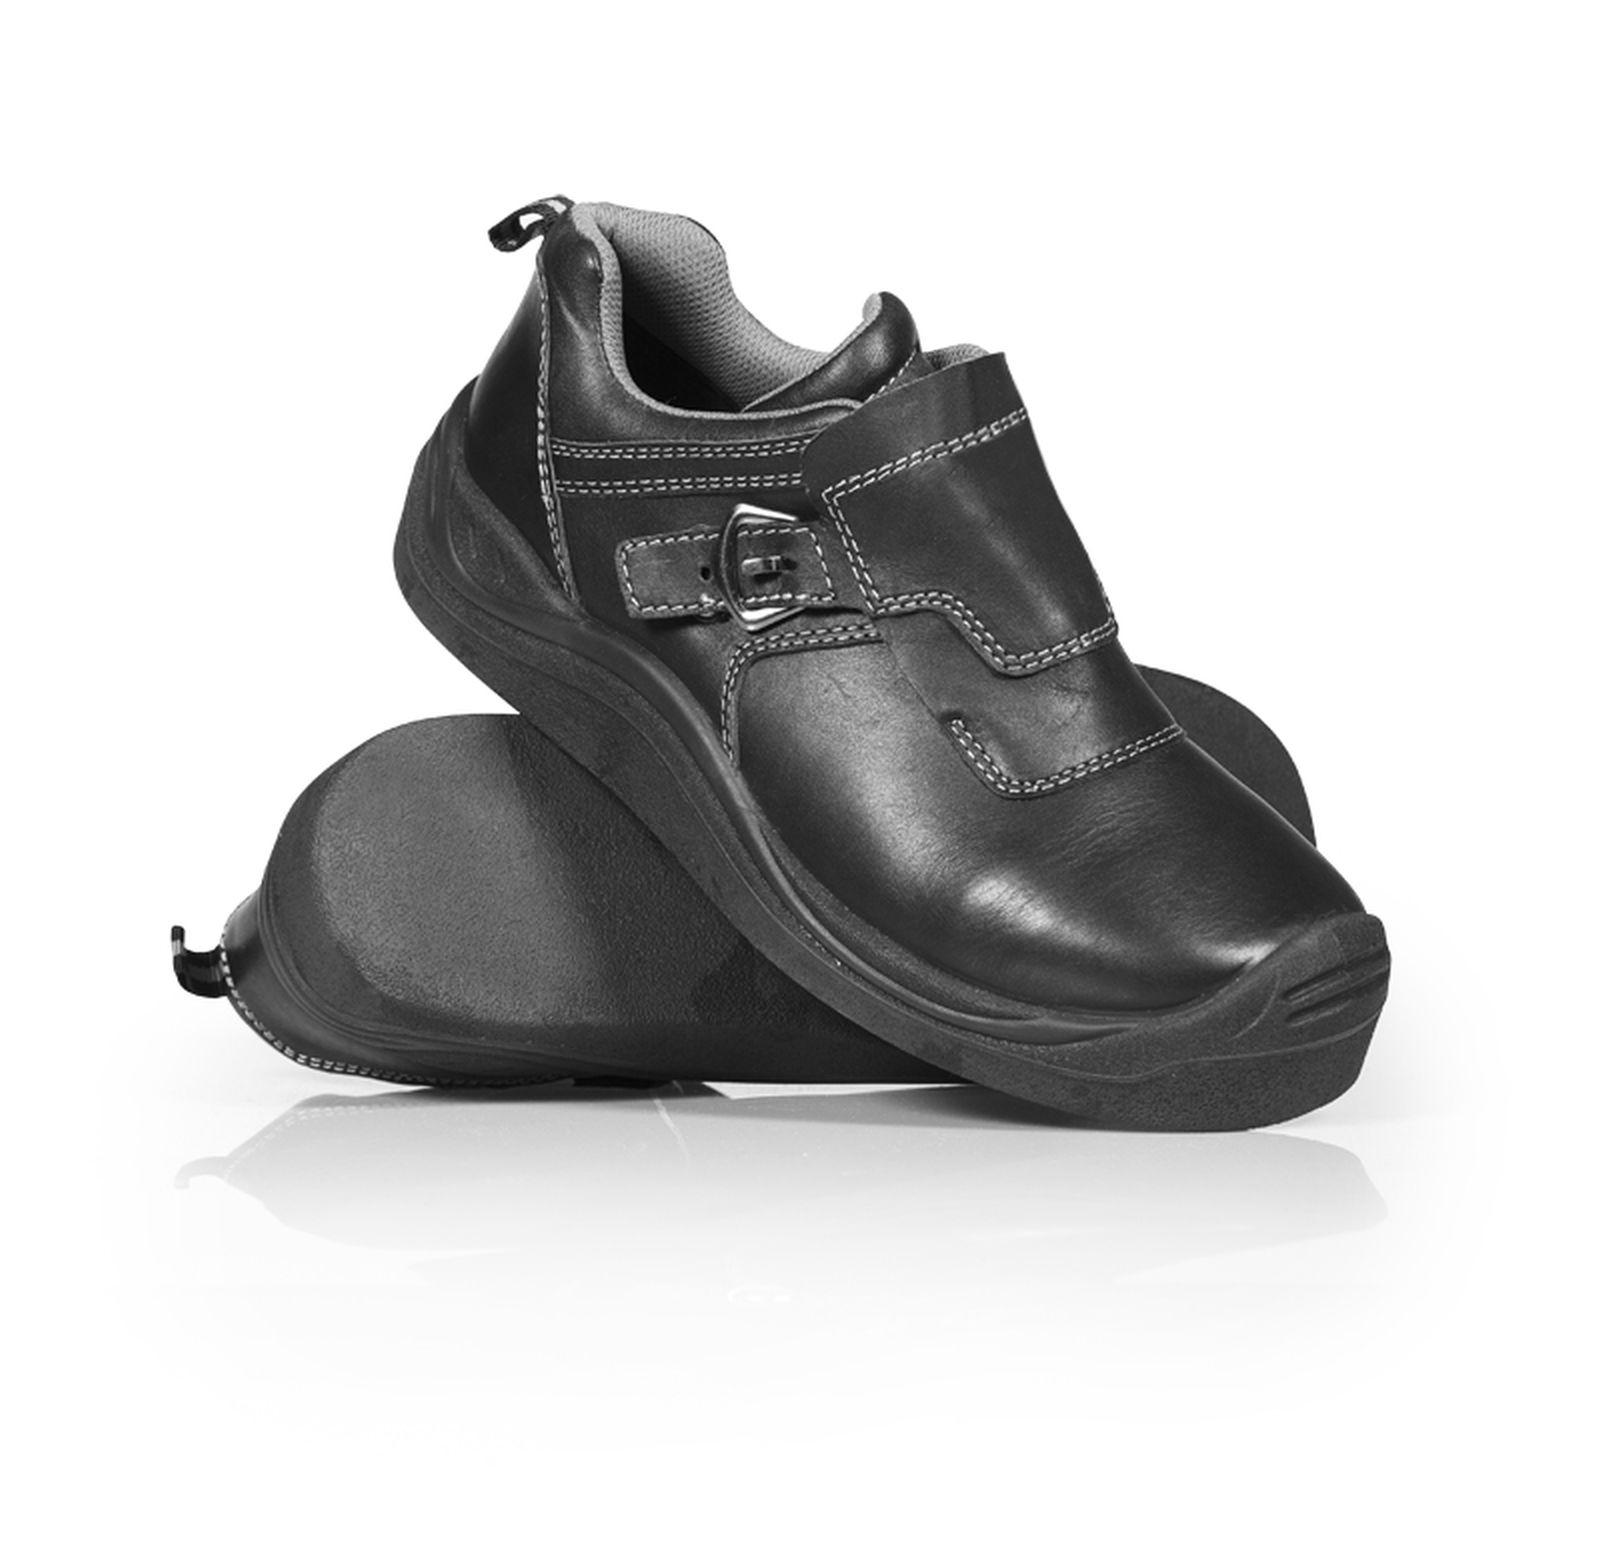 Blaklader Veiligheidsschoenen 24180000 Hittebestendig zwart(9900)